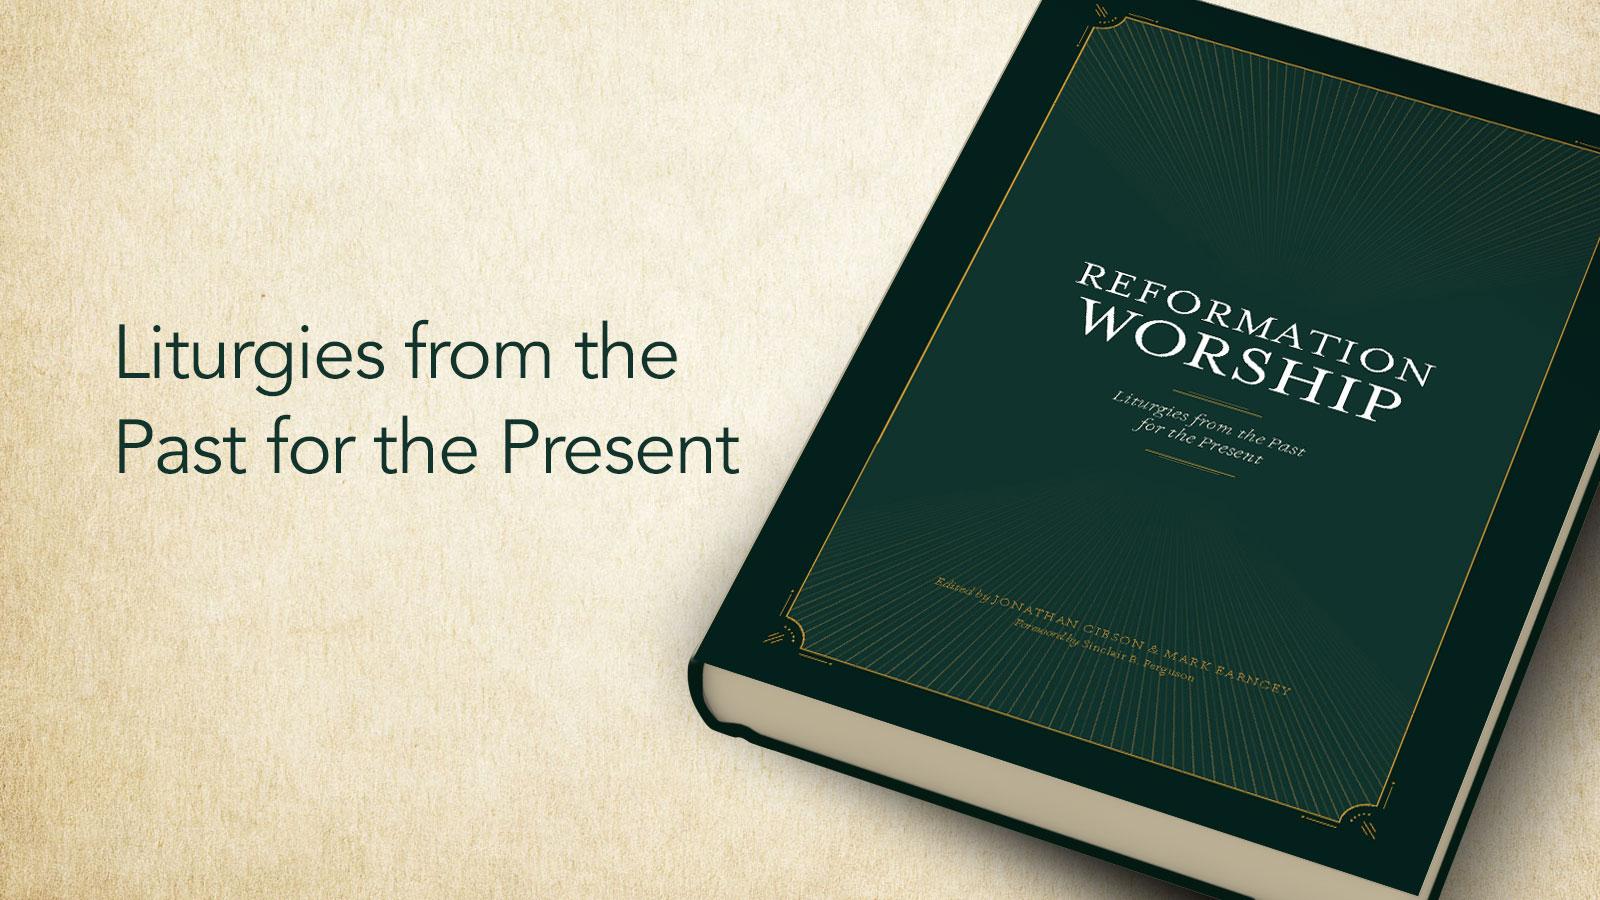 Reformation Worship